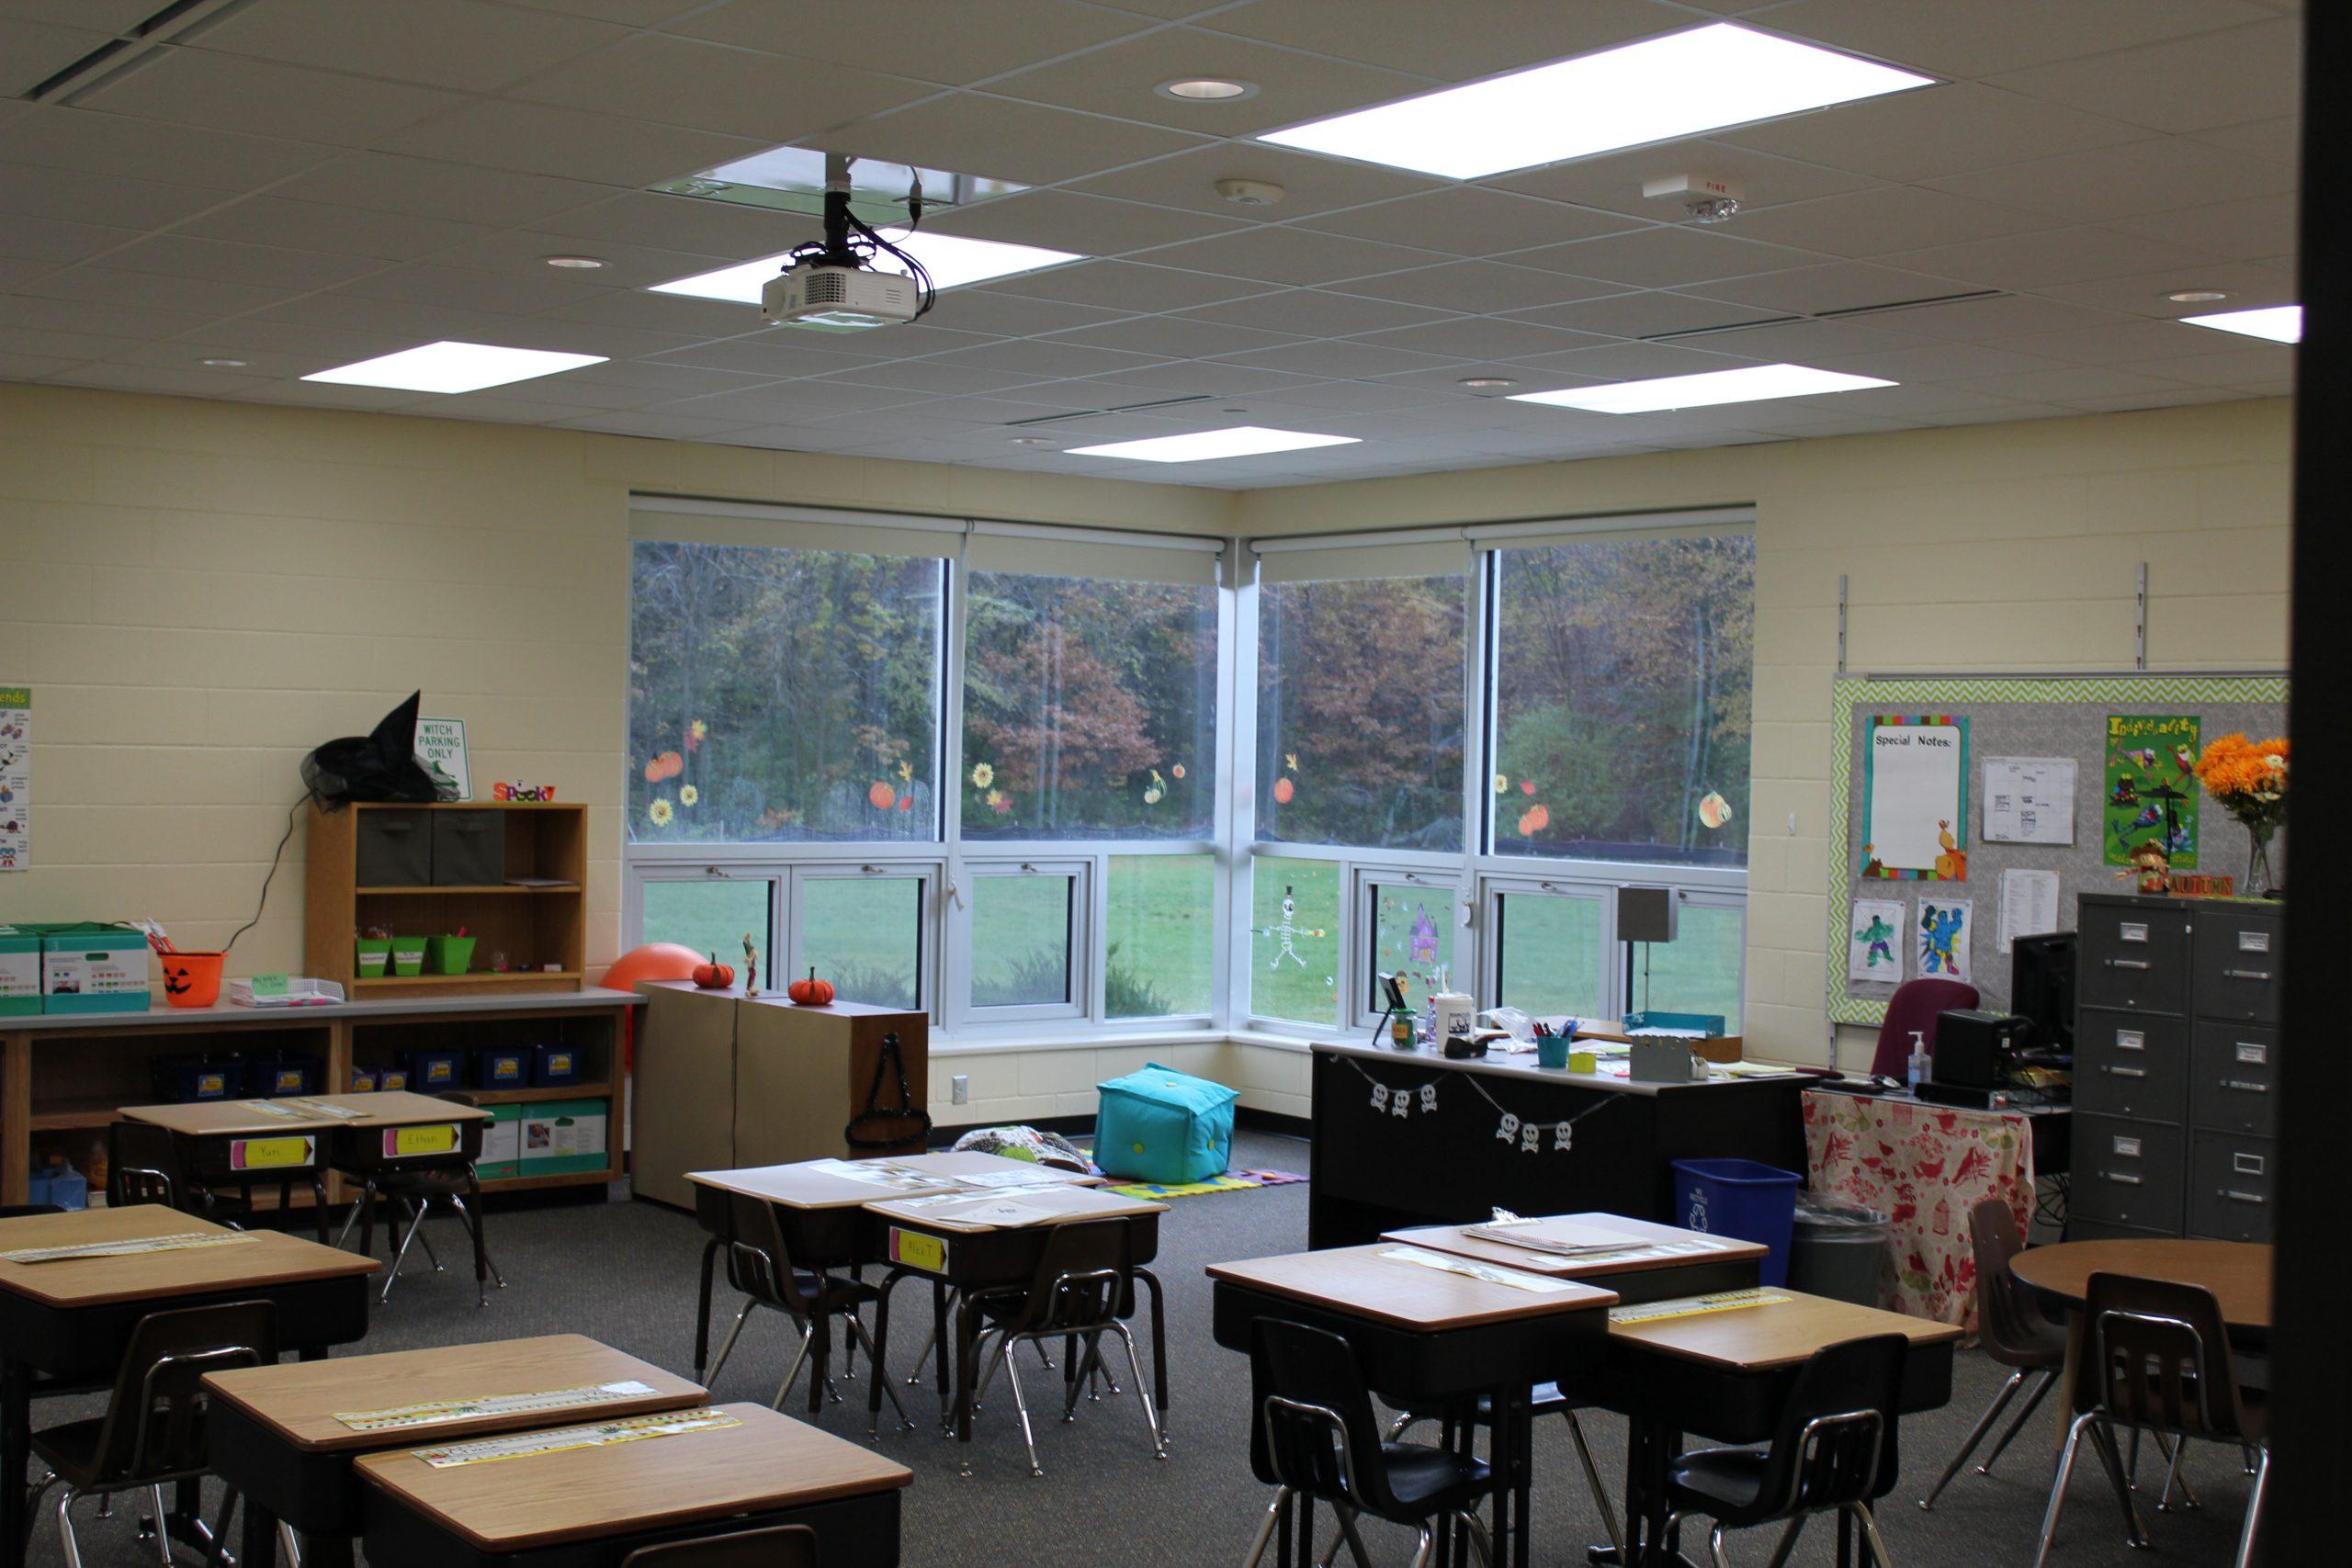 Classroom 0